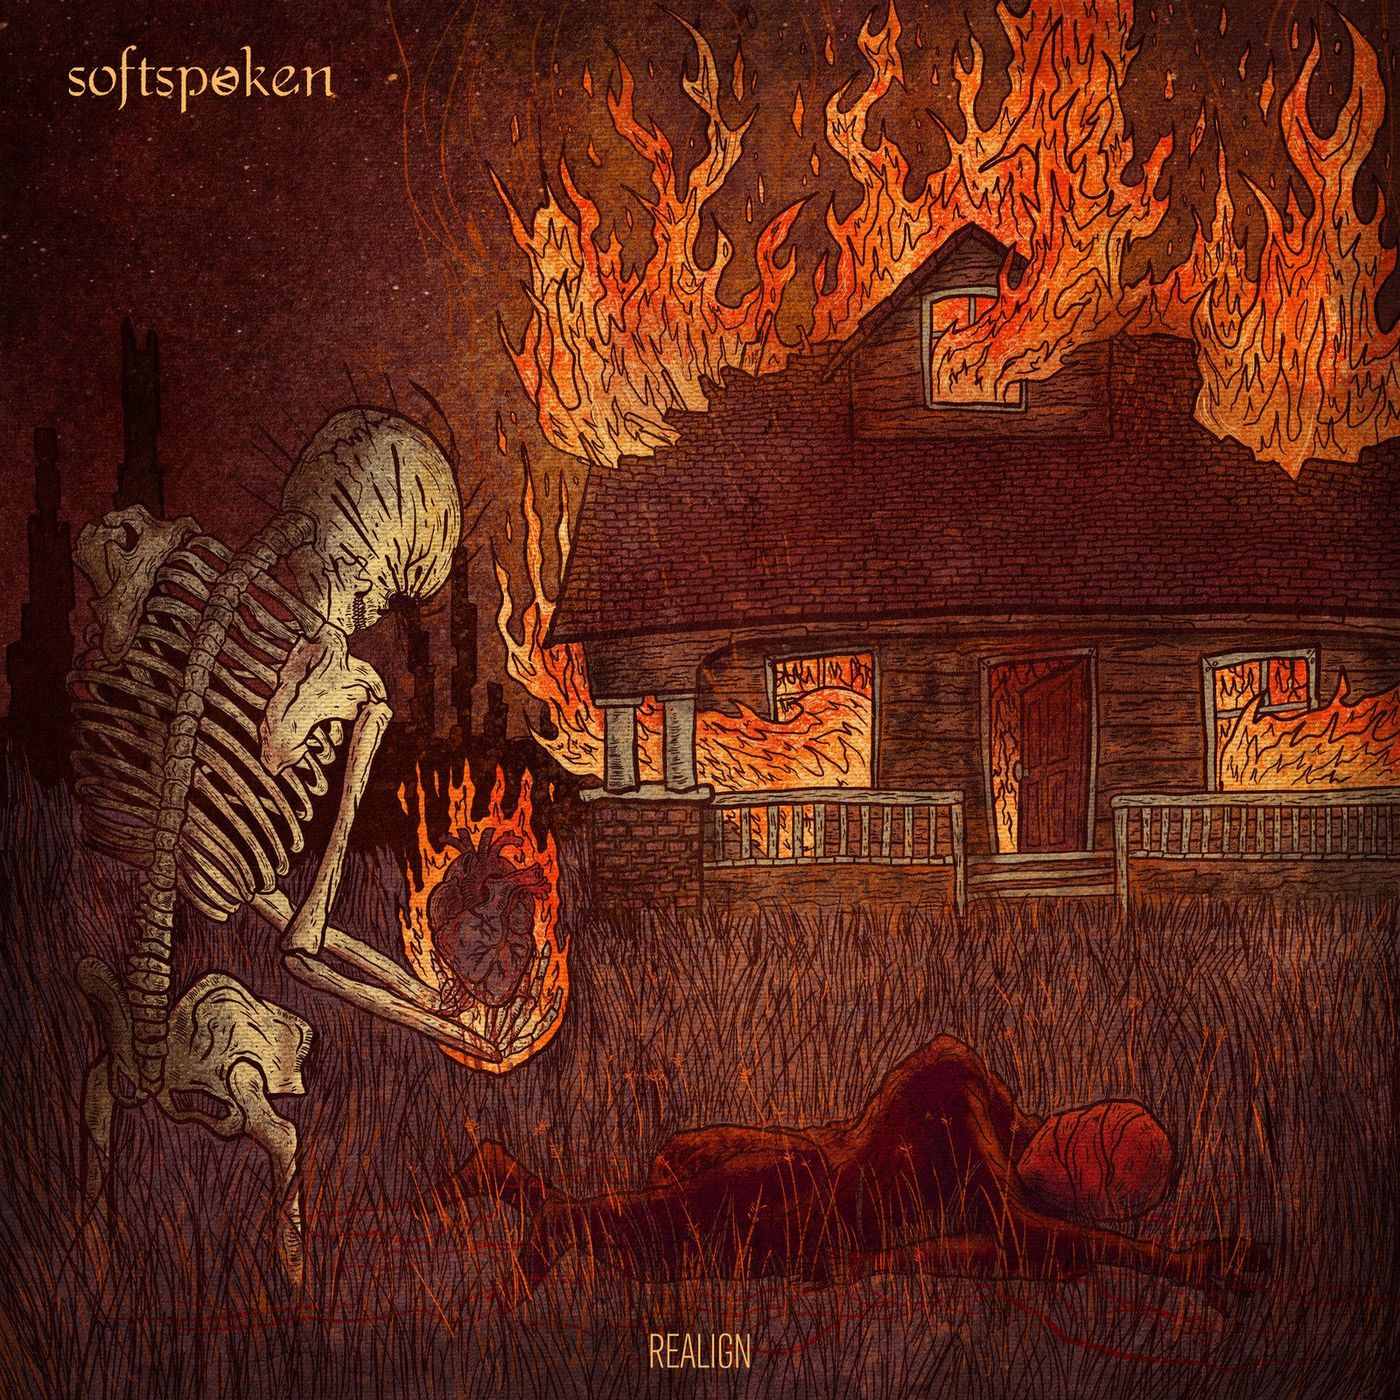 Softspoken - Realign [single] (2021)